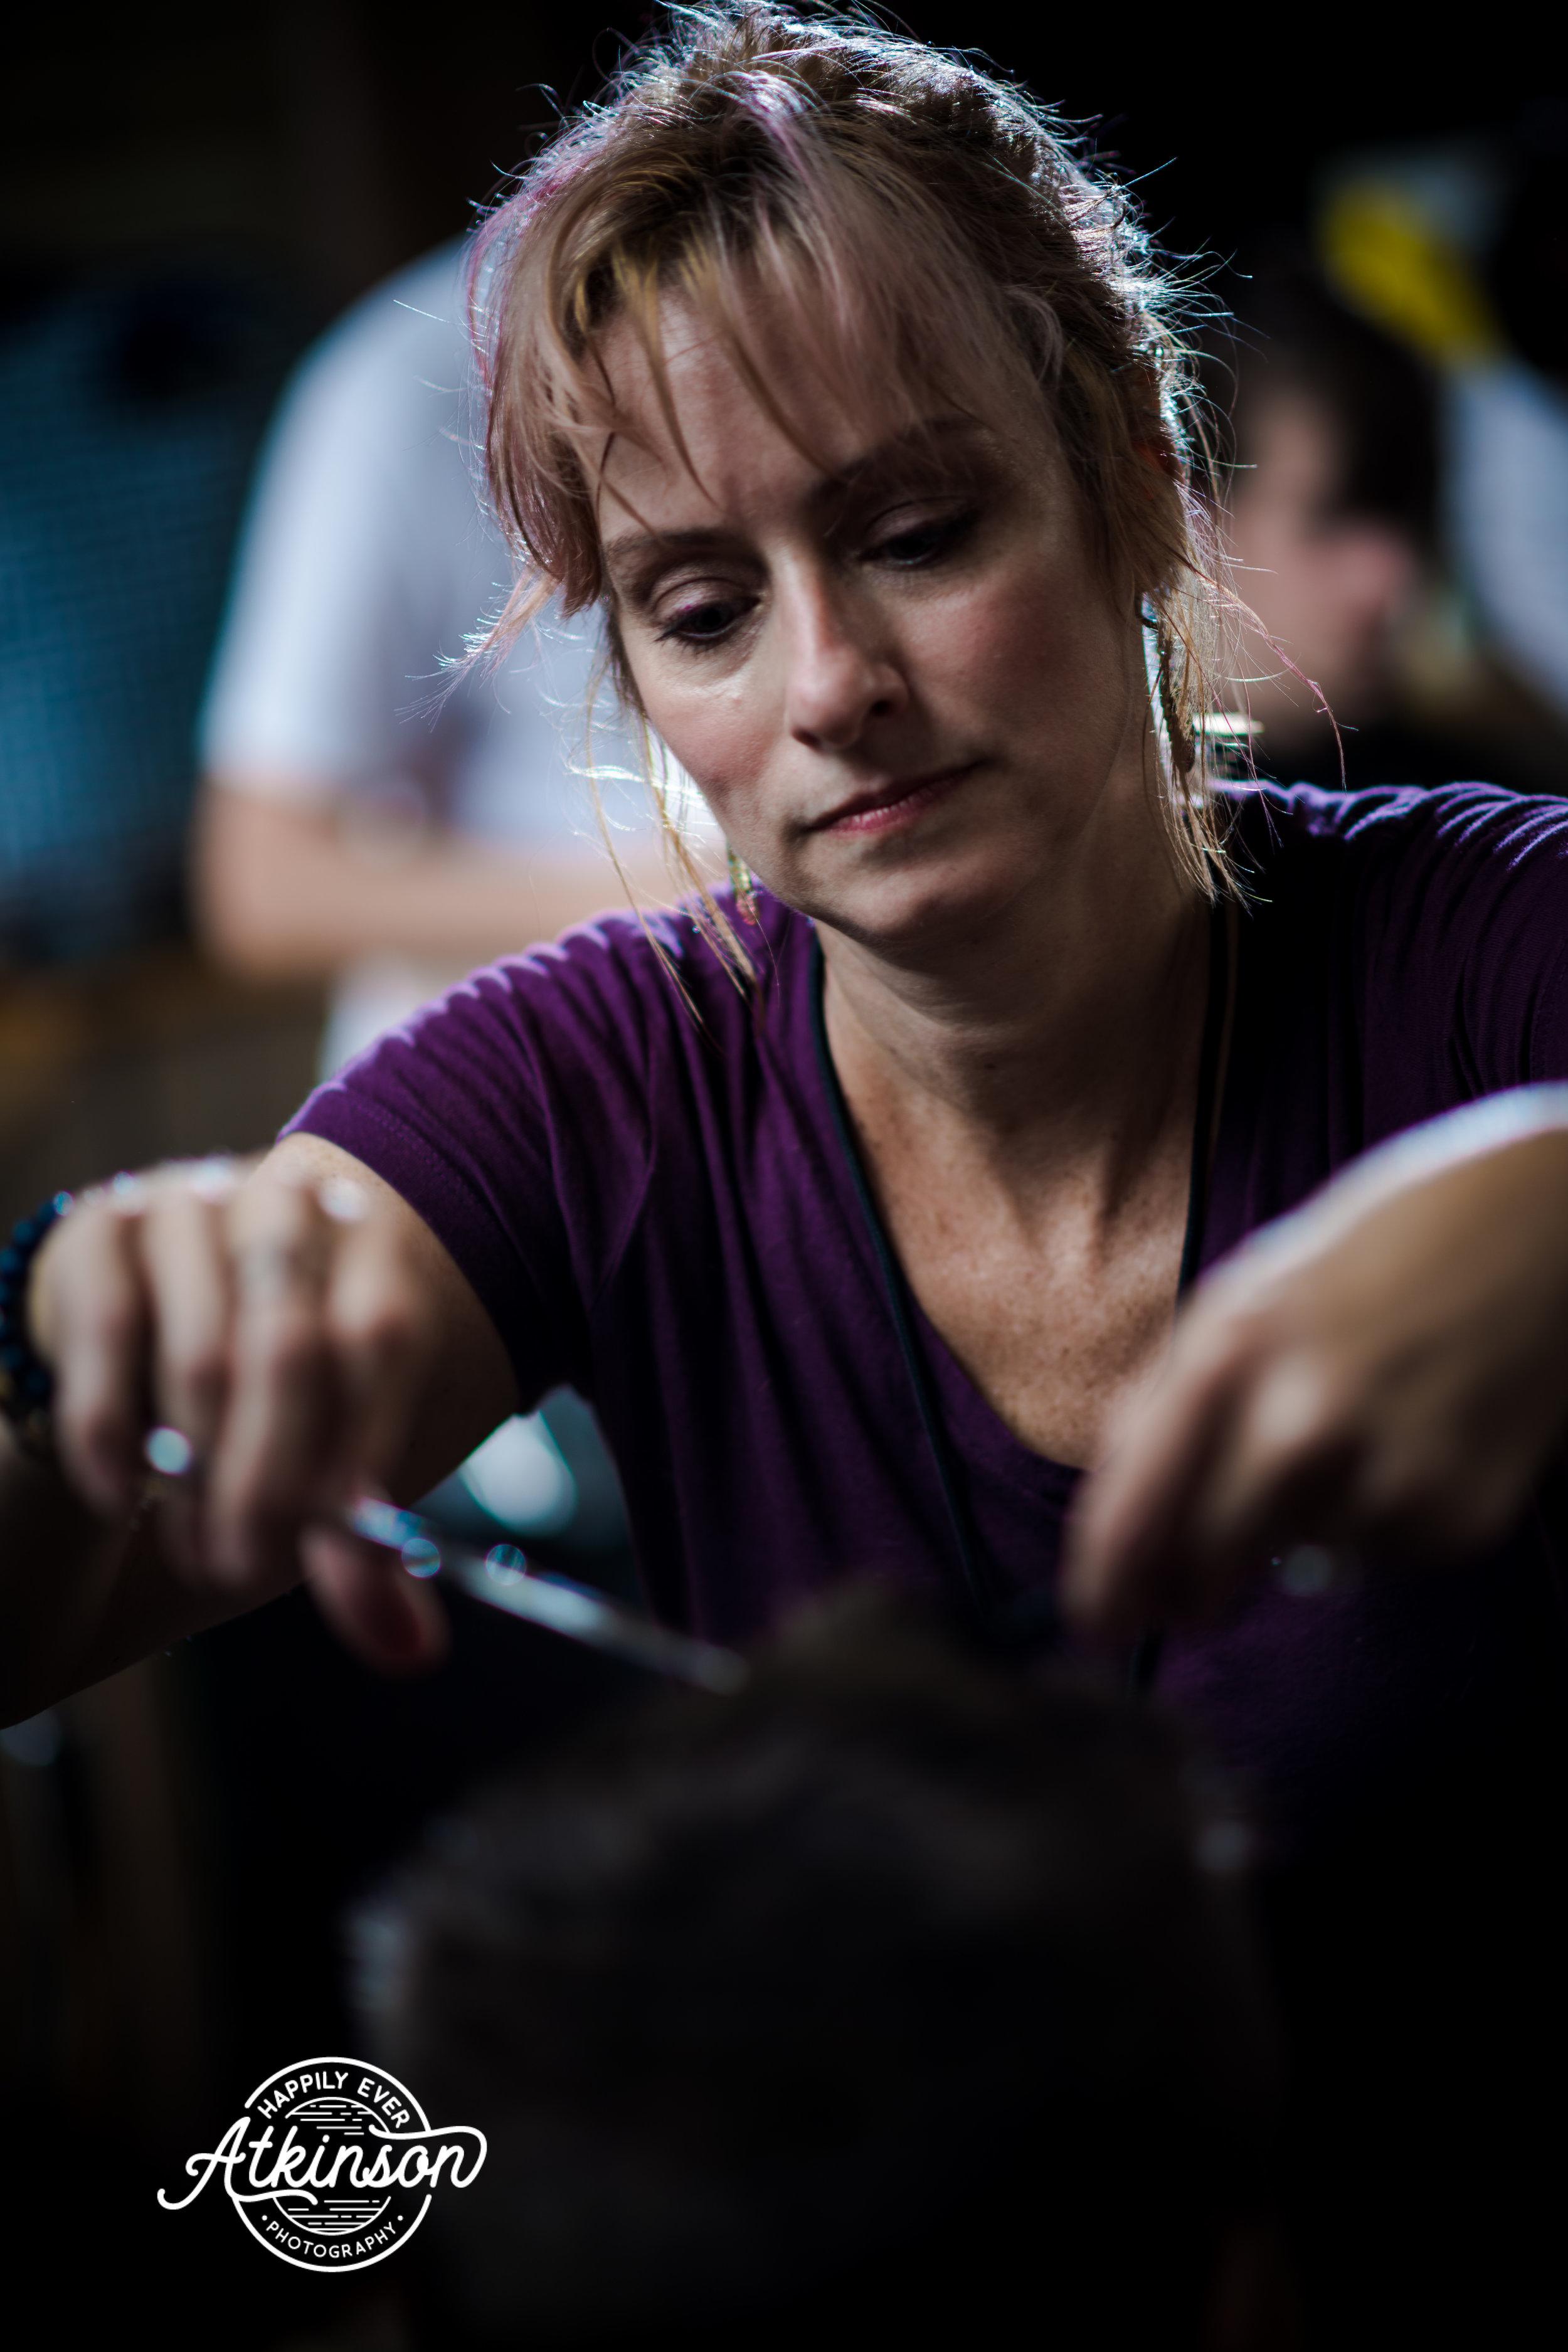 Woman gives a haircut